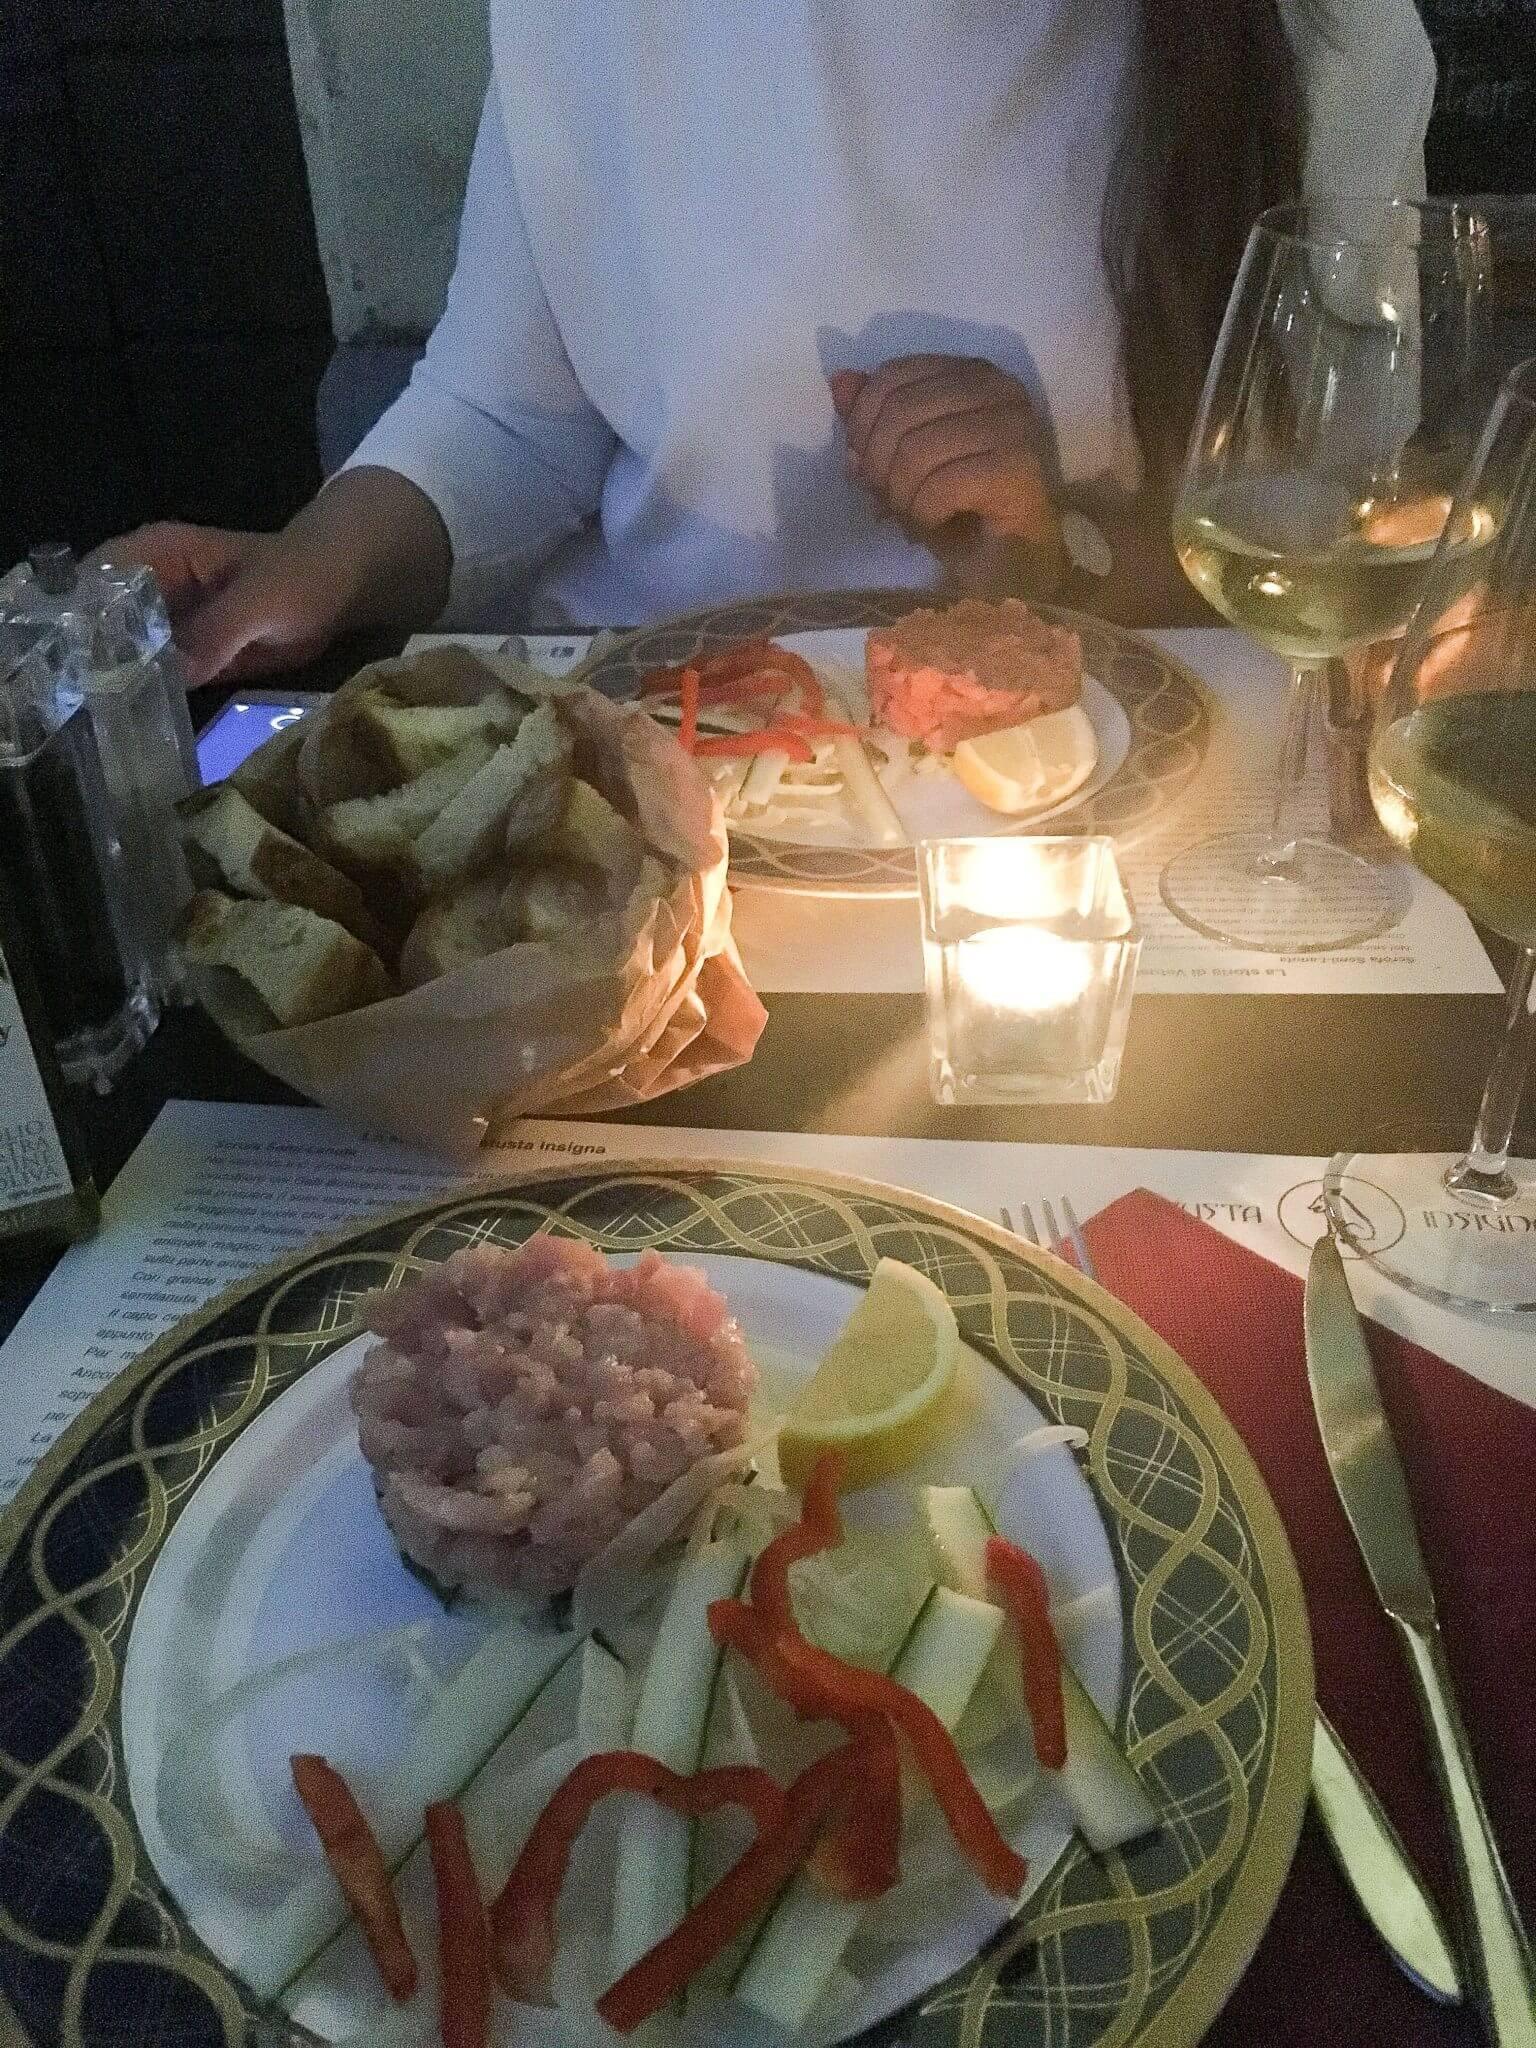 Mailand:TravelGuide;architecture;milanotravelguide;food;pizza;drinks